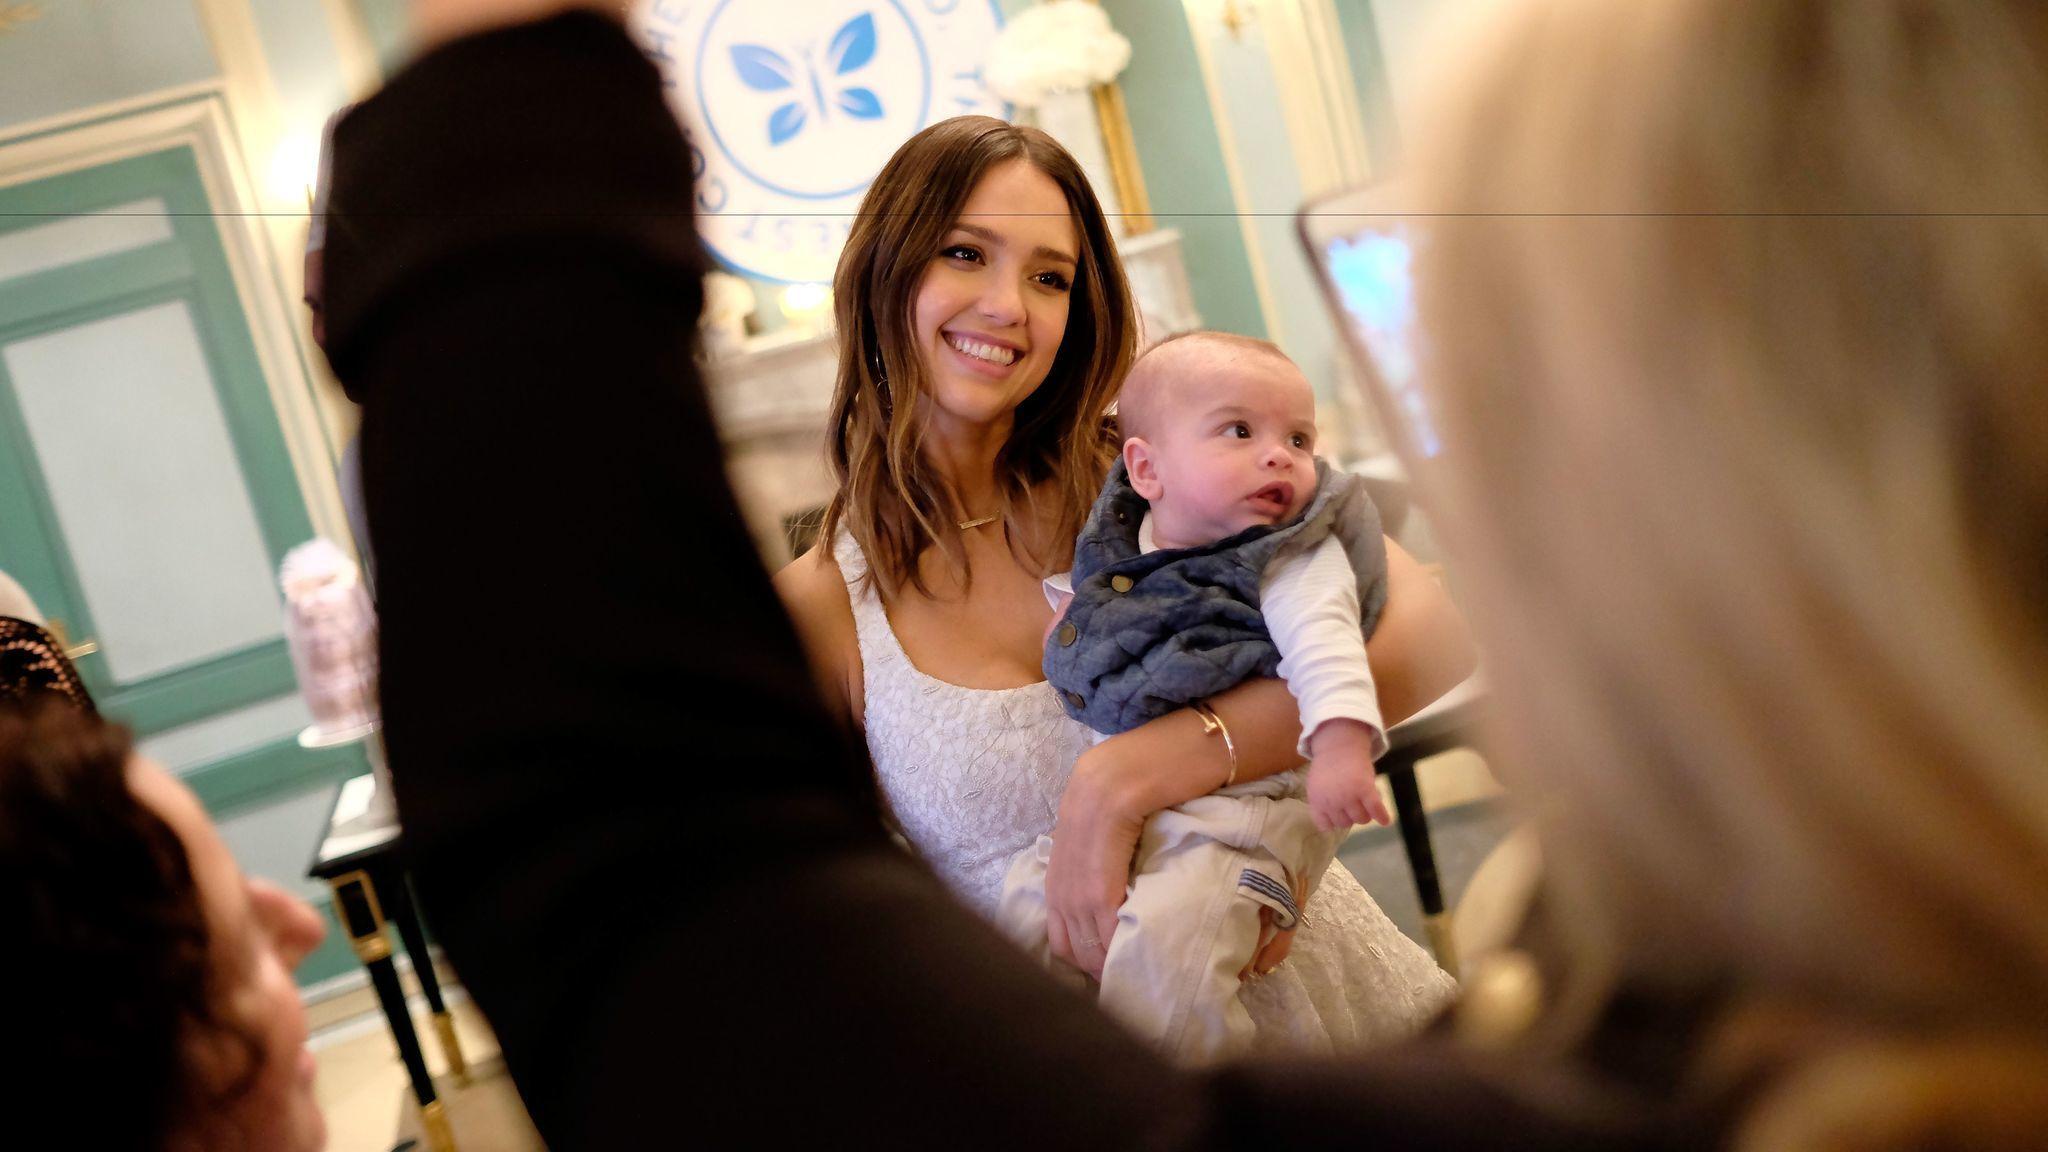 Honest Co Recalls Organic Baby Powder Over Infection